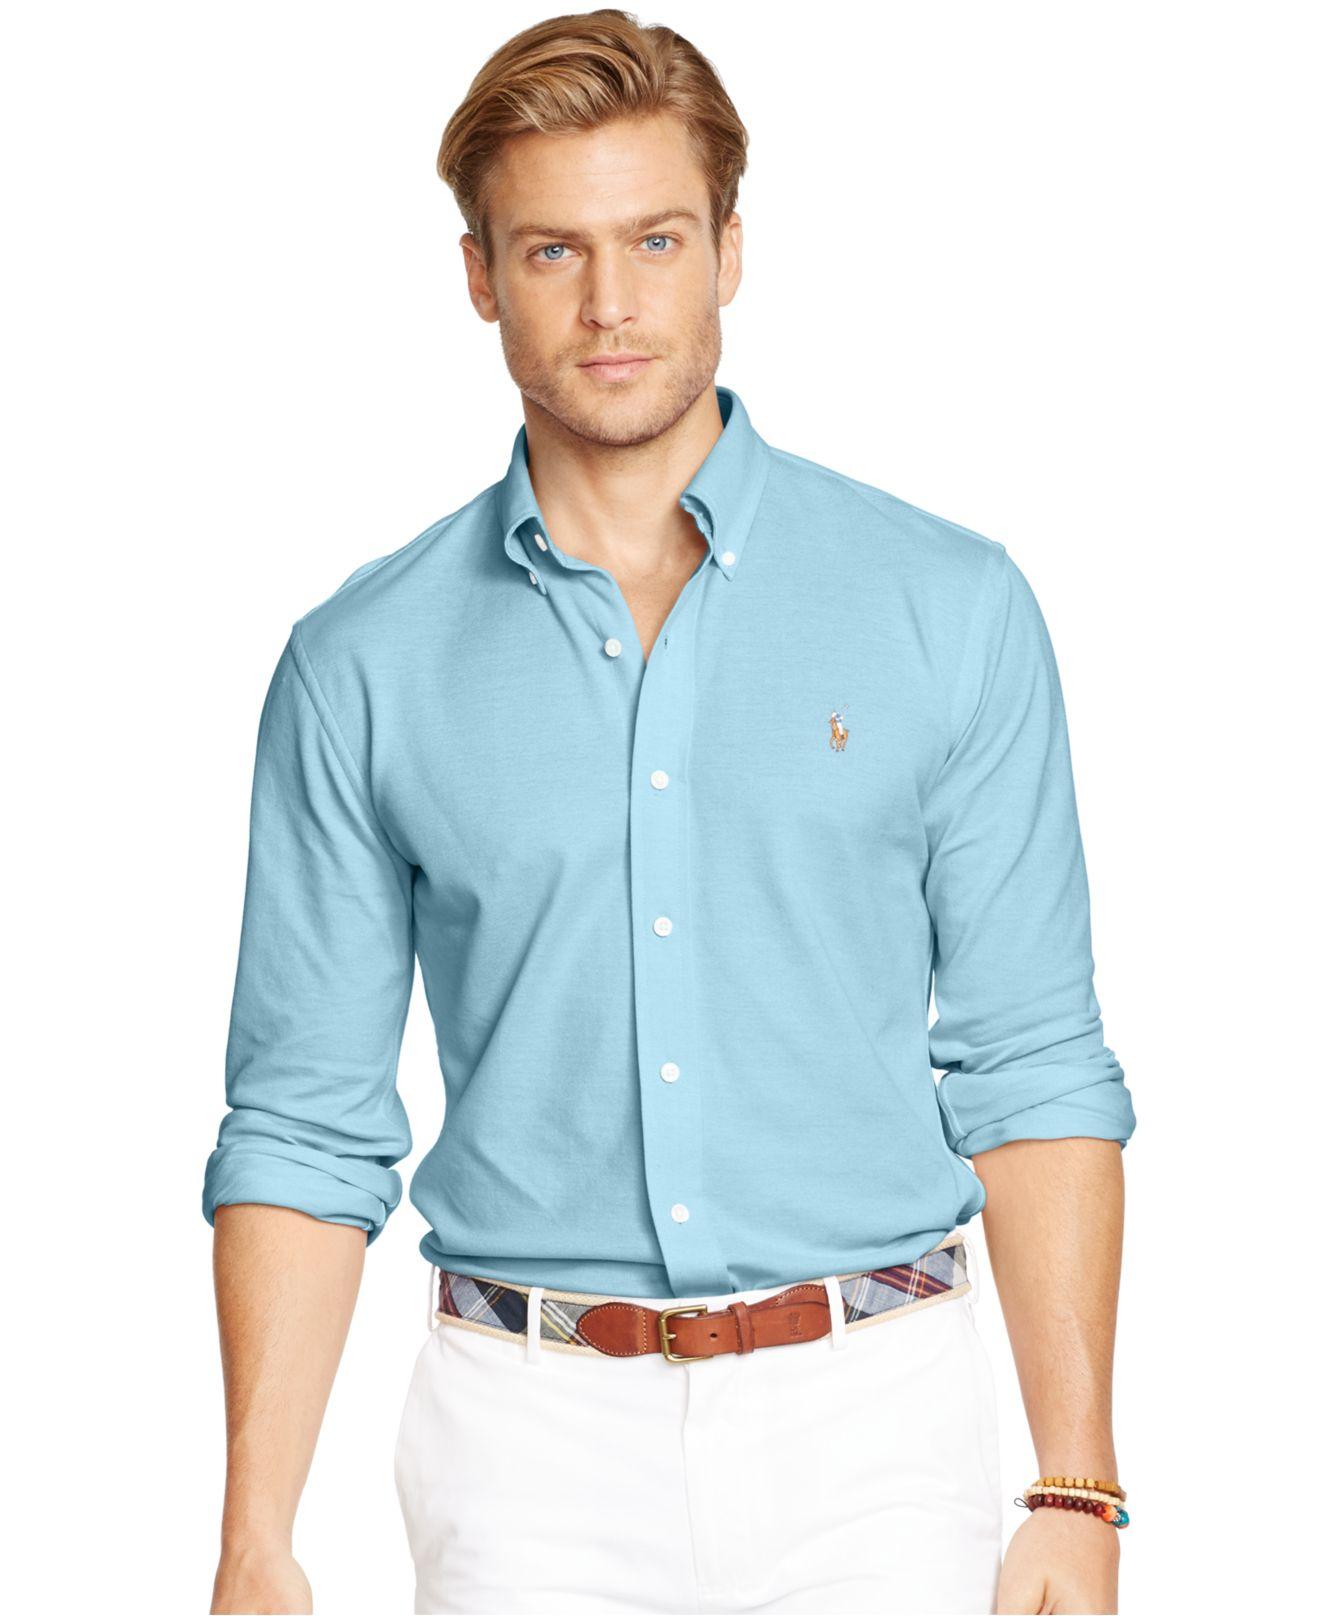 polo ralph lauren oxford piqu sport shirt in blue for men lyst. Black Bedroom Furniture Sets. Home Design Ideas